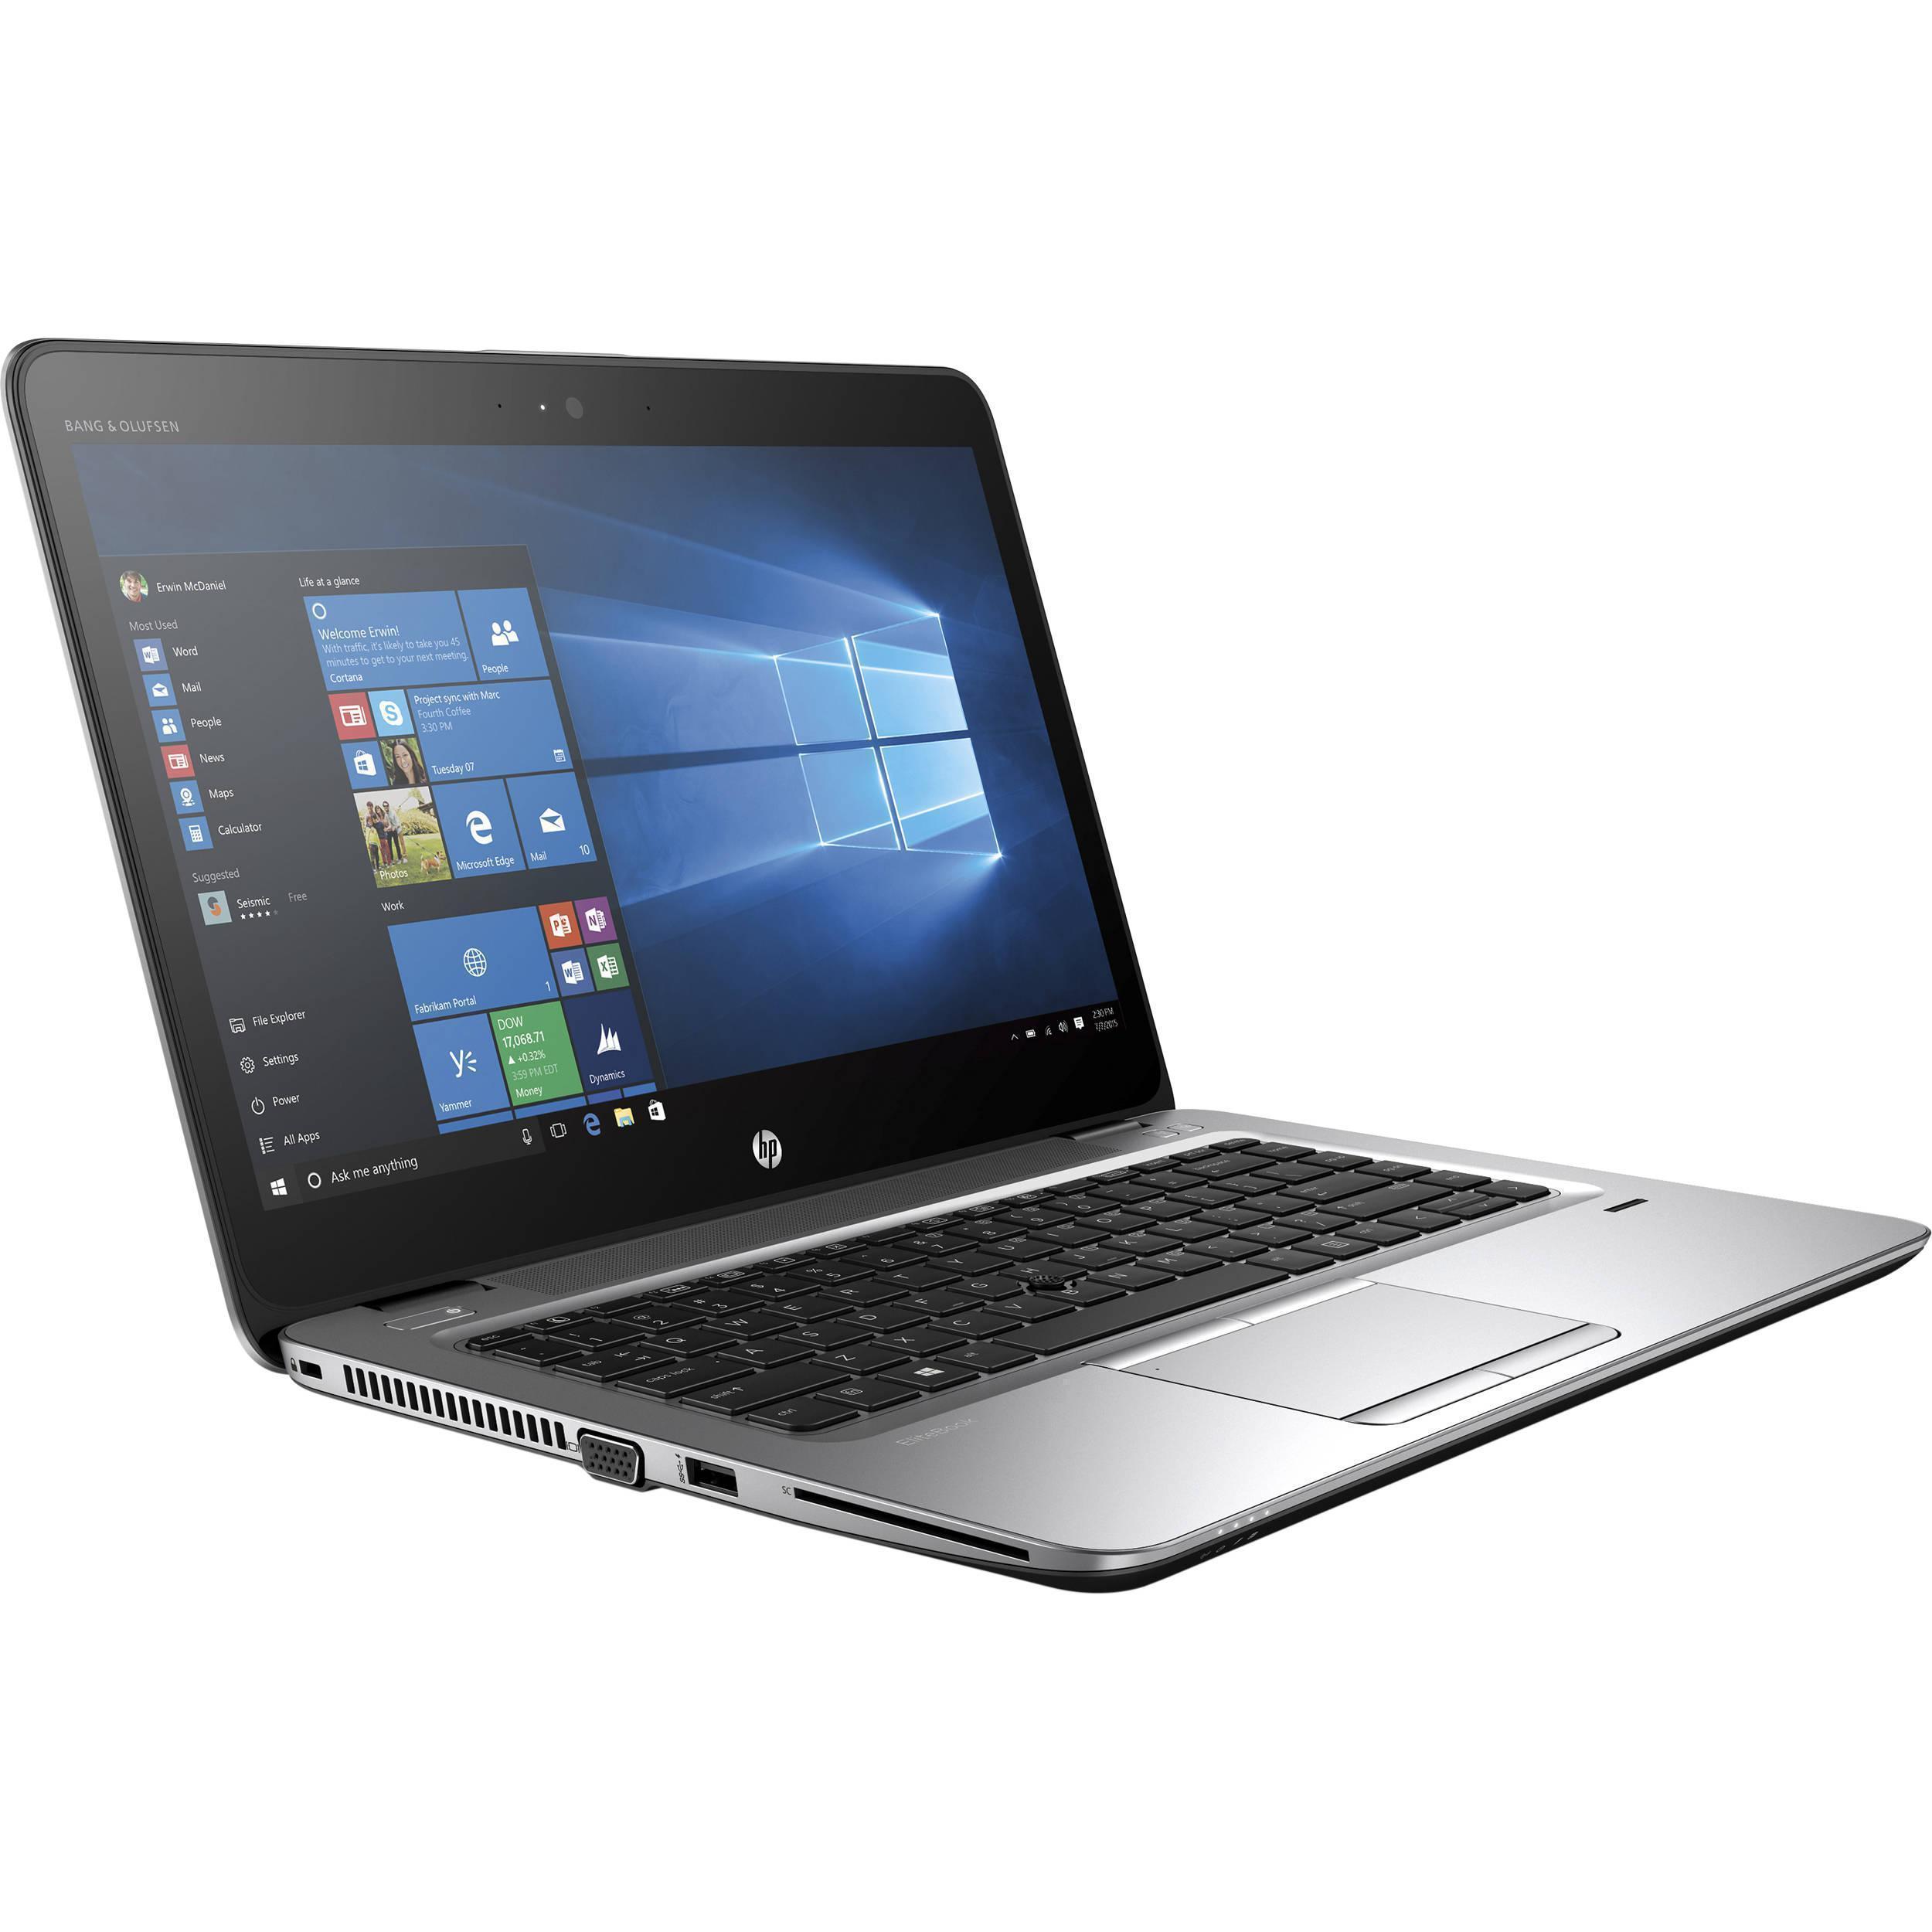 HP EliteBook 840 G2 14-inch (2014) - Core i5-5200U - 16GB - SSD 120 GB AZERTY - French